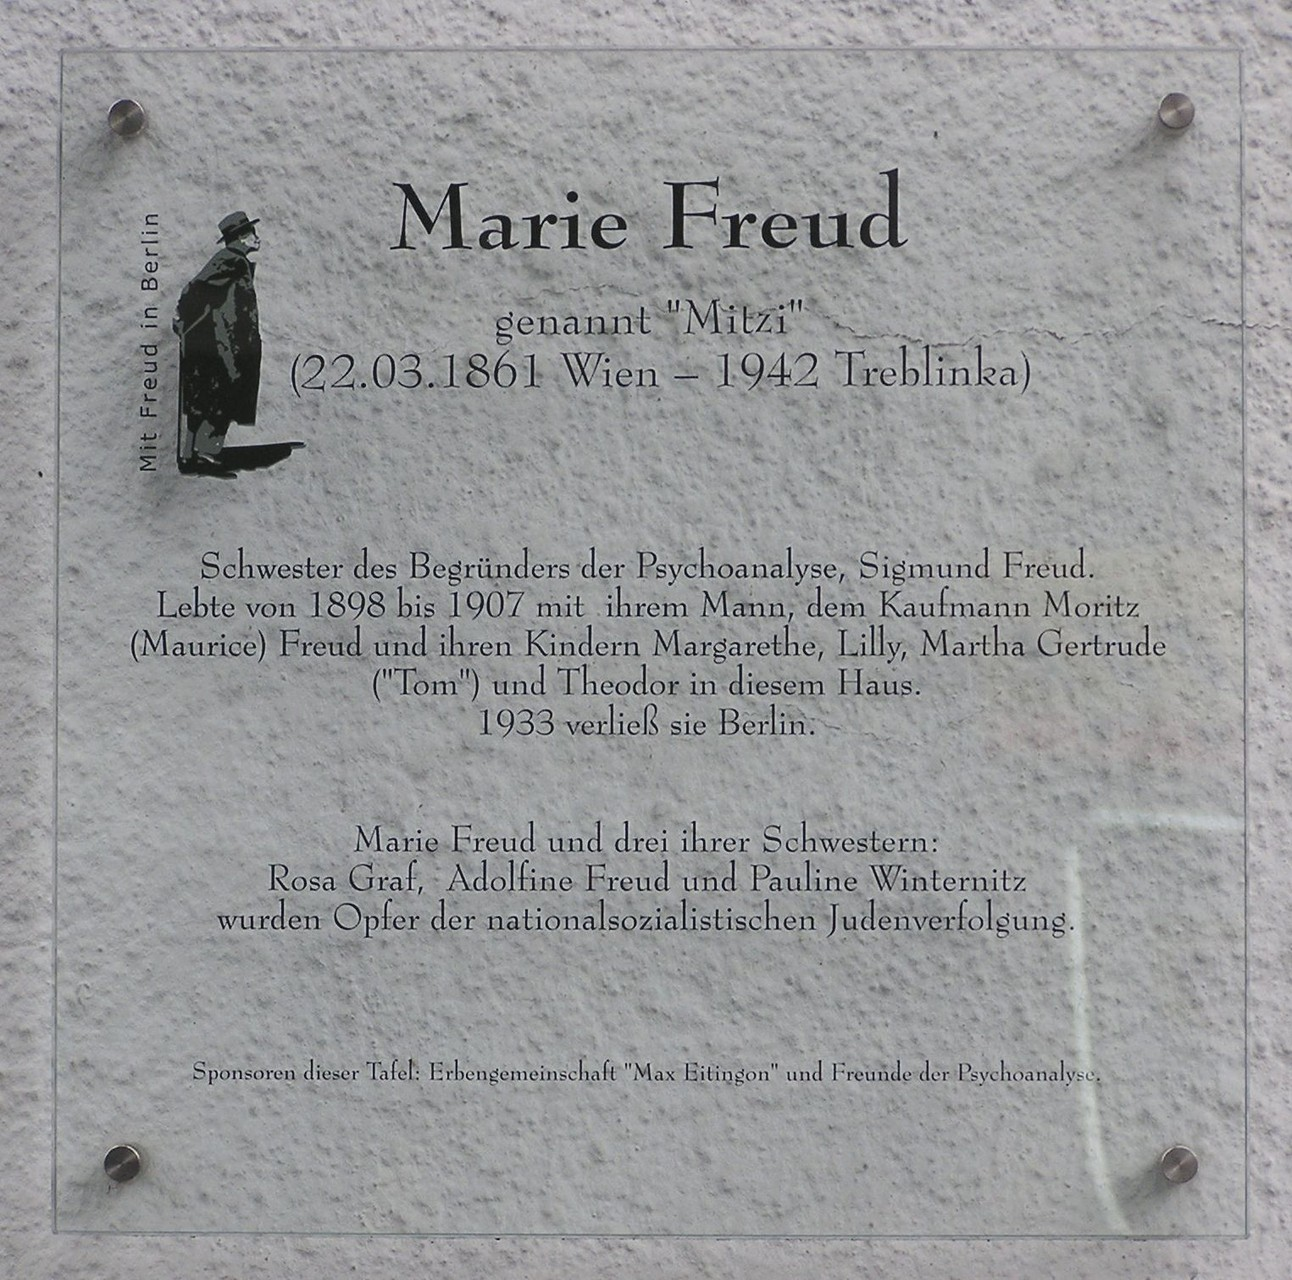 Marie Freud